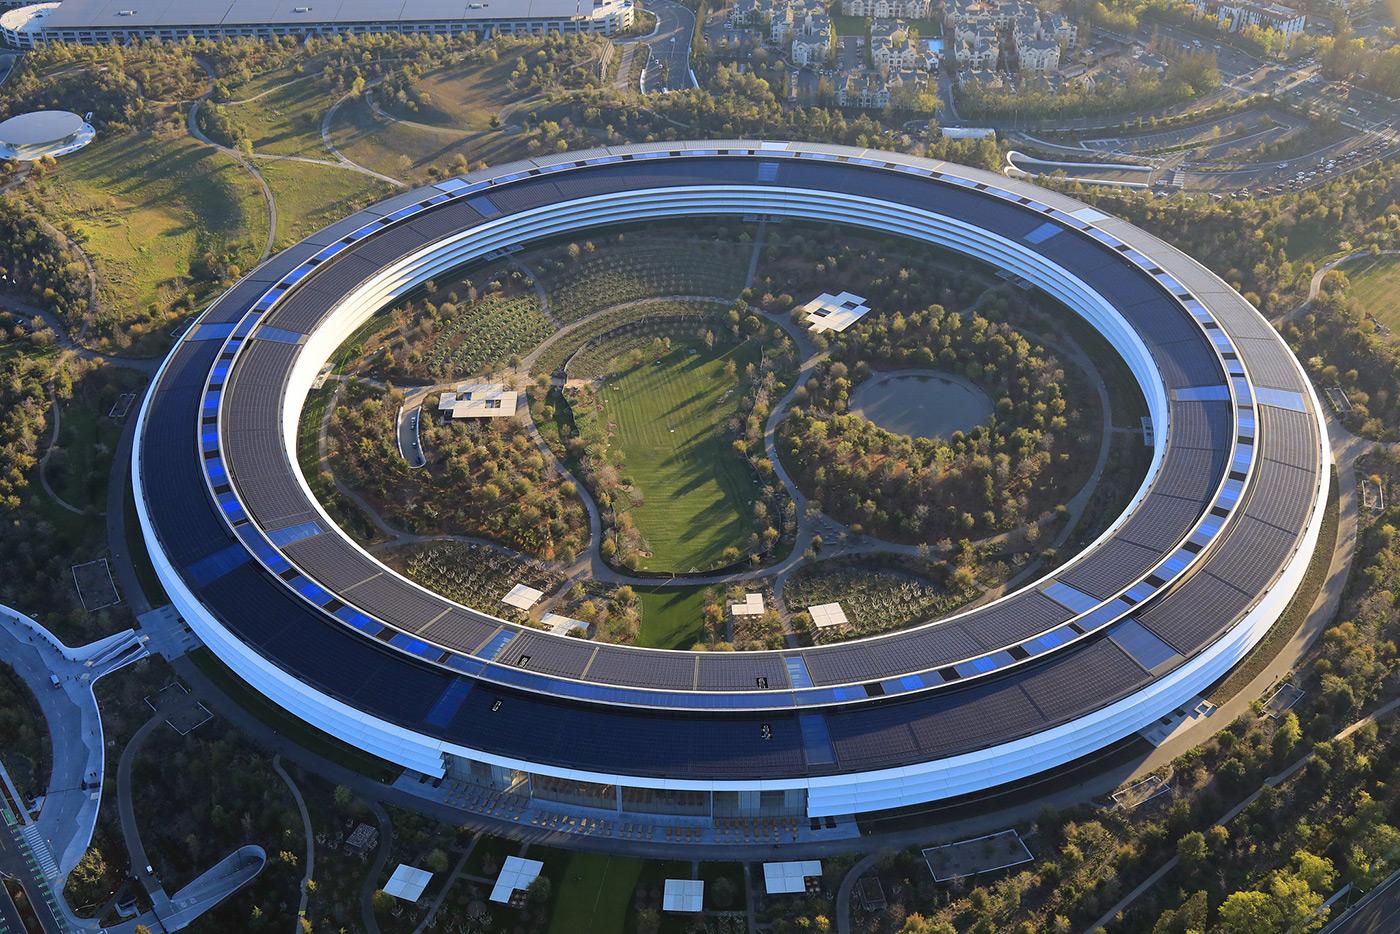 #Эхо97: взлетит ли ARM от Apple; смартфон с раздвижным экраном от Oppo; новая штаб-квартира «Яндекса»